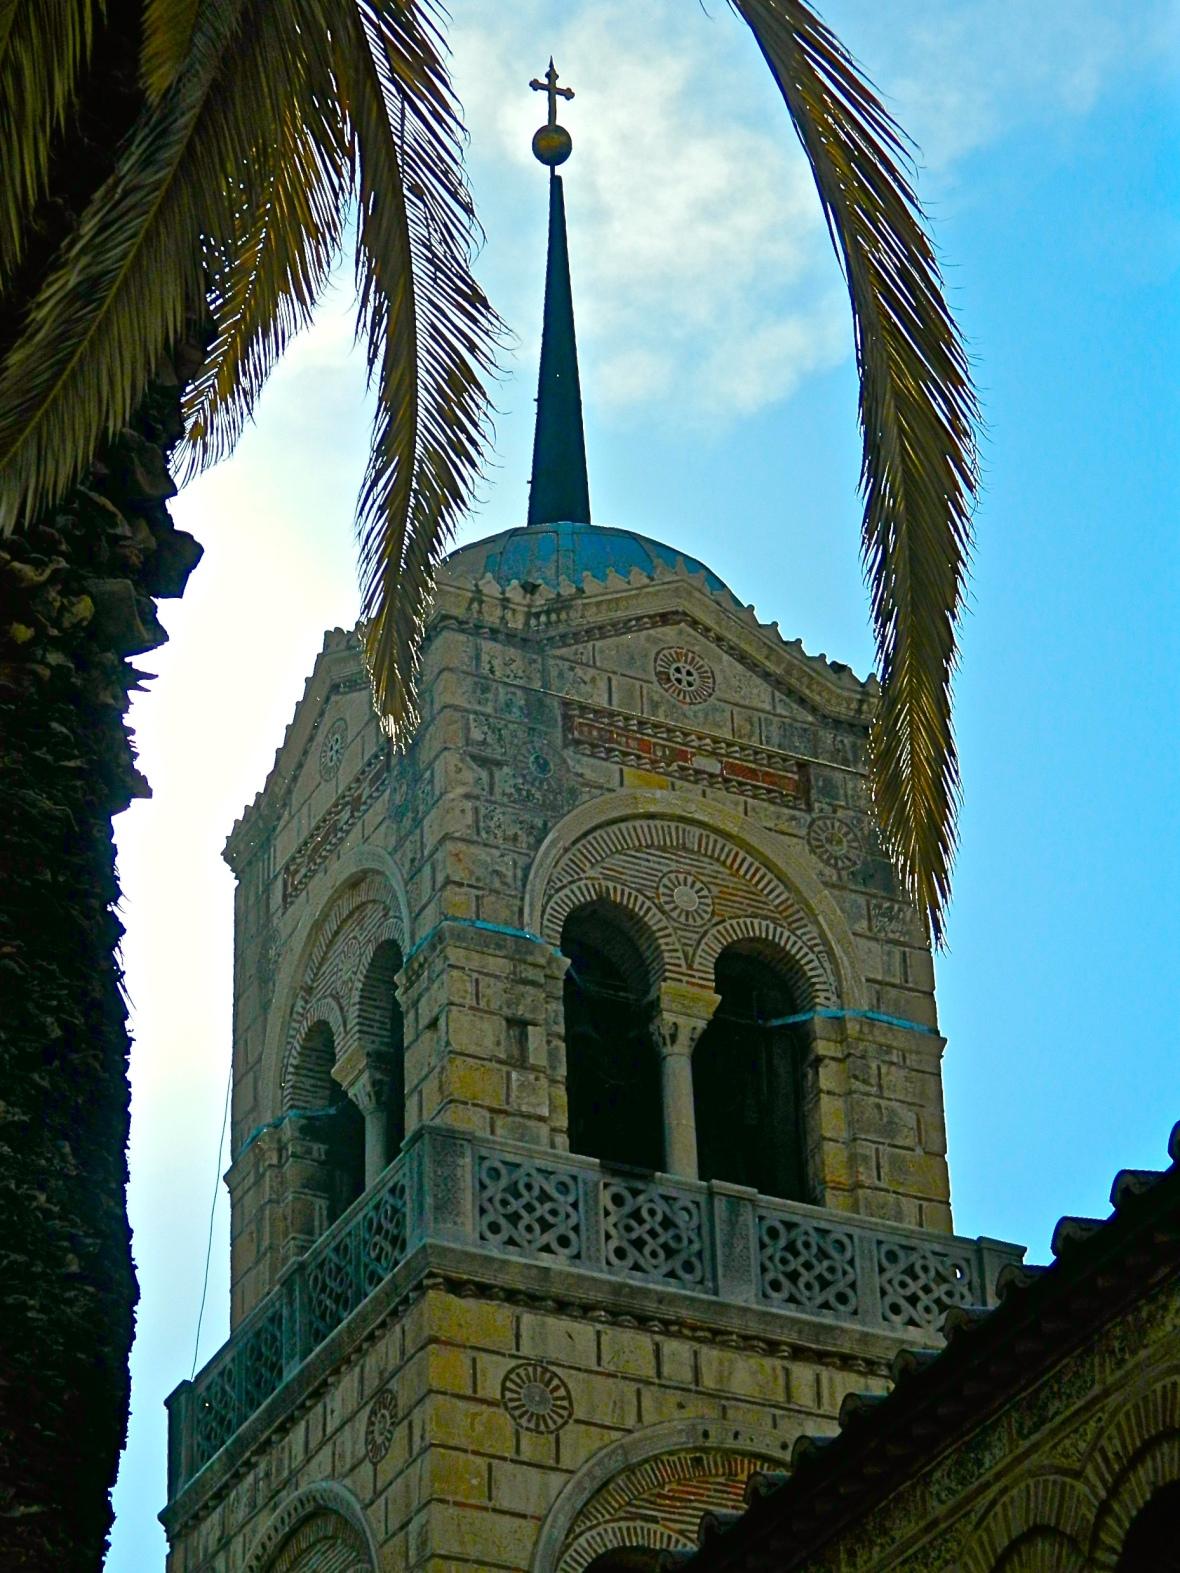 Church Steeple and Palms